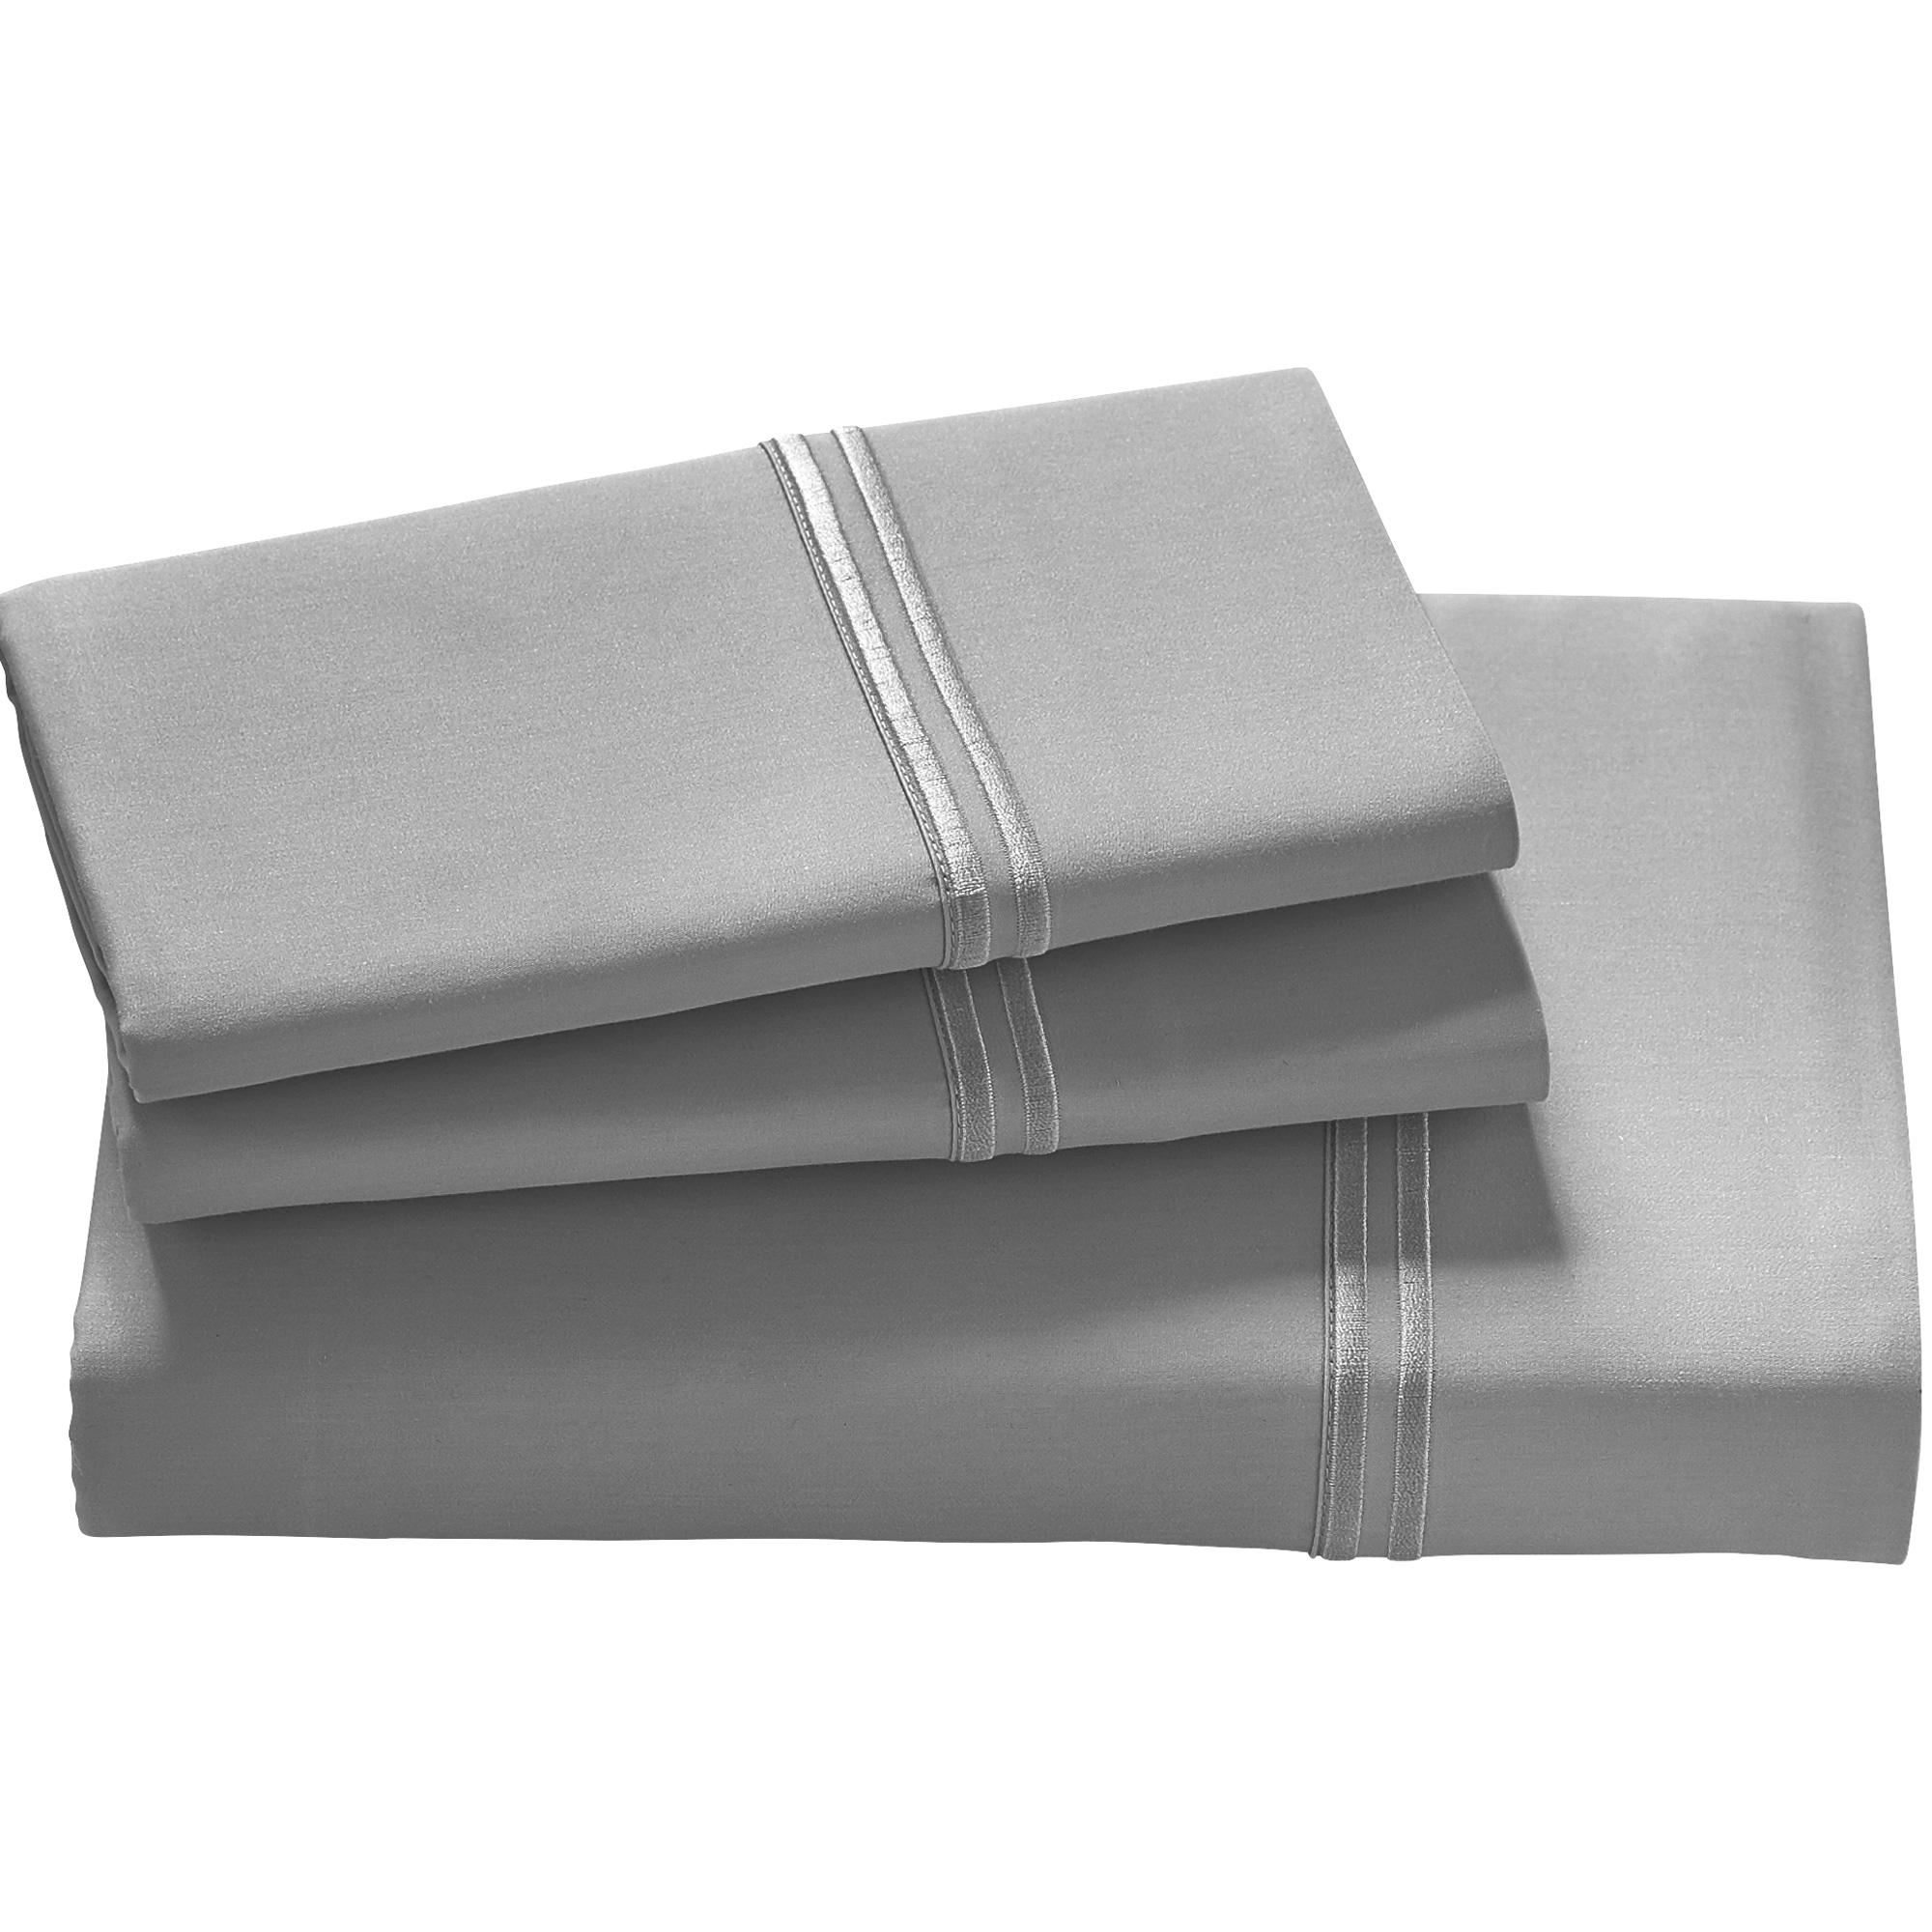 Purecare | Elements Dove Gray Full Modal Sheet Set